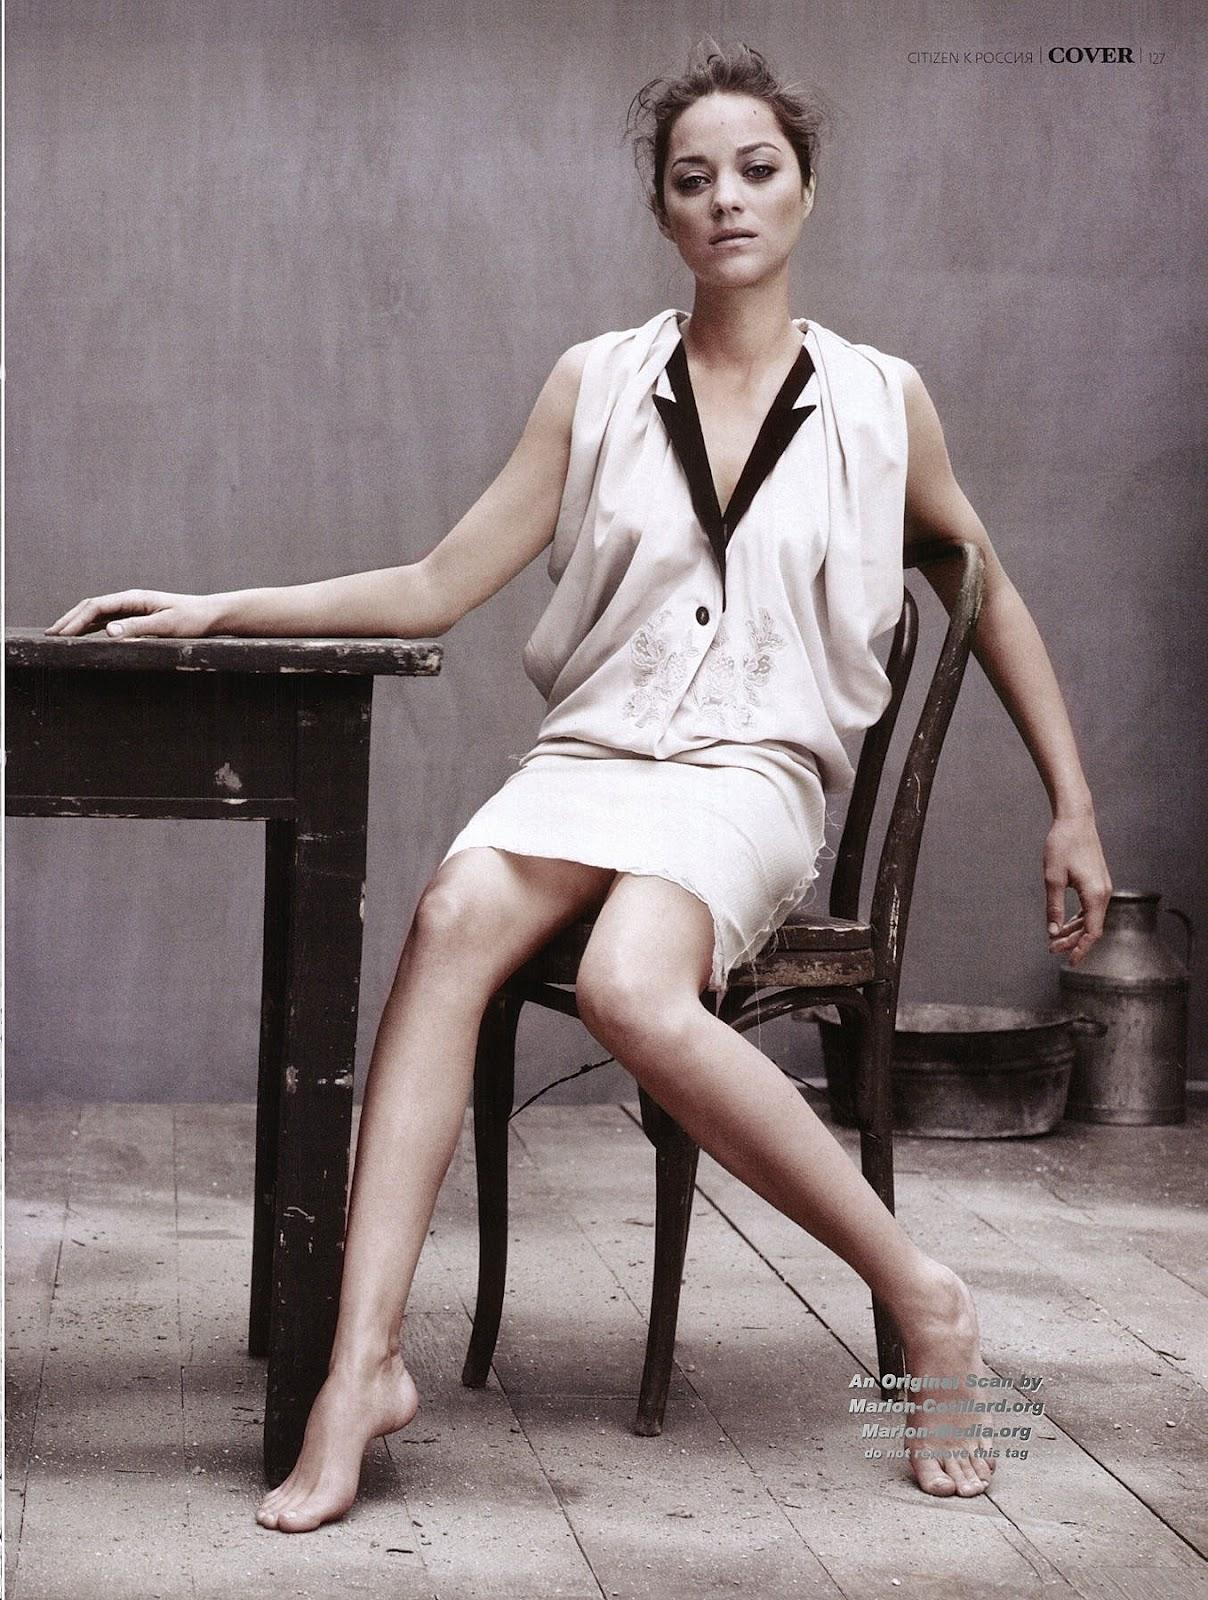 Marion Cotillard | Celebrity Pictures